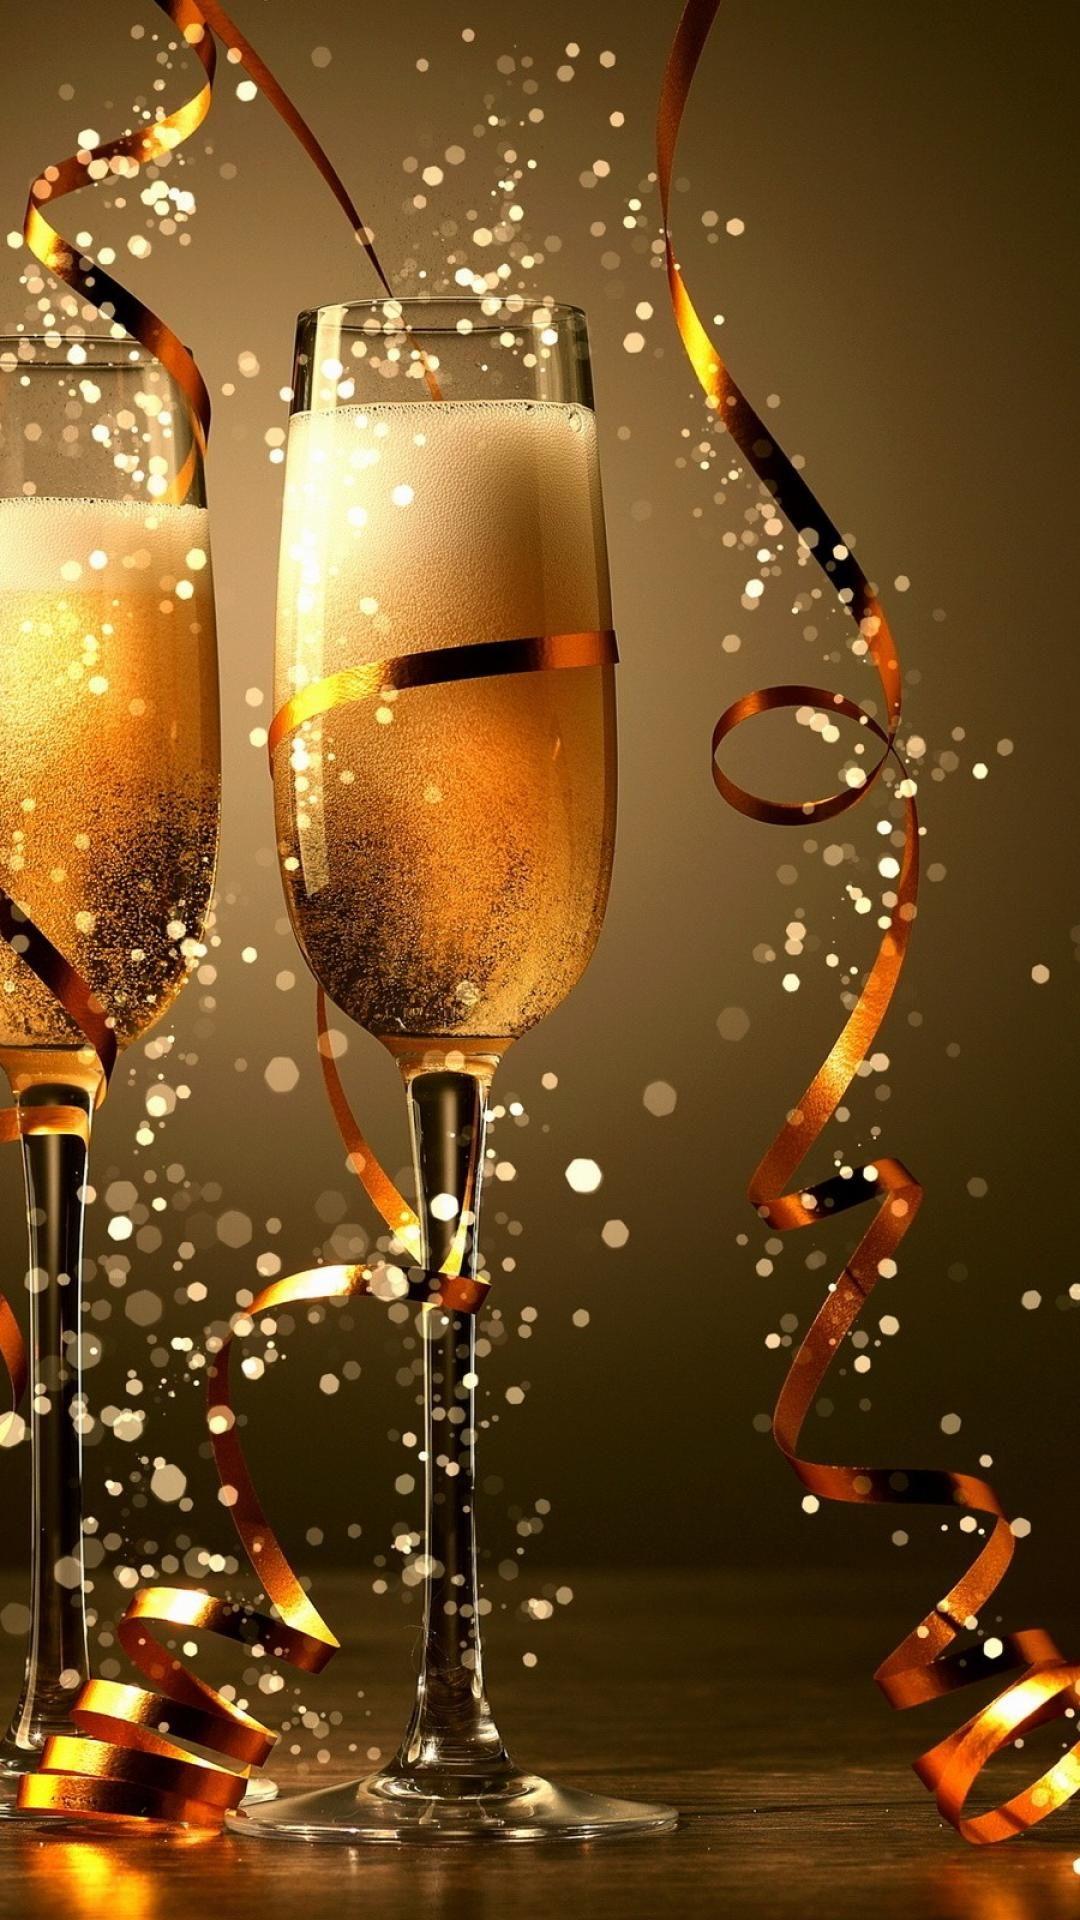 Happy New Year Happy new year wallpaper New year wallpaper 1080x1920